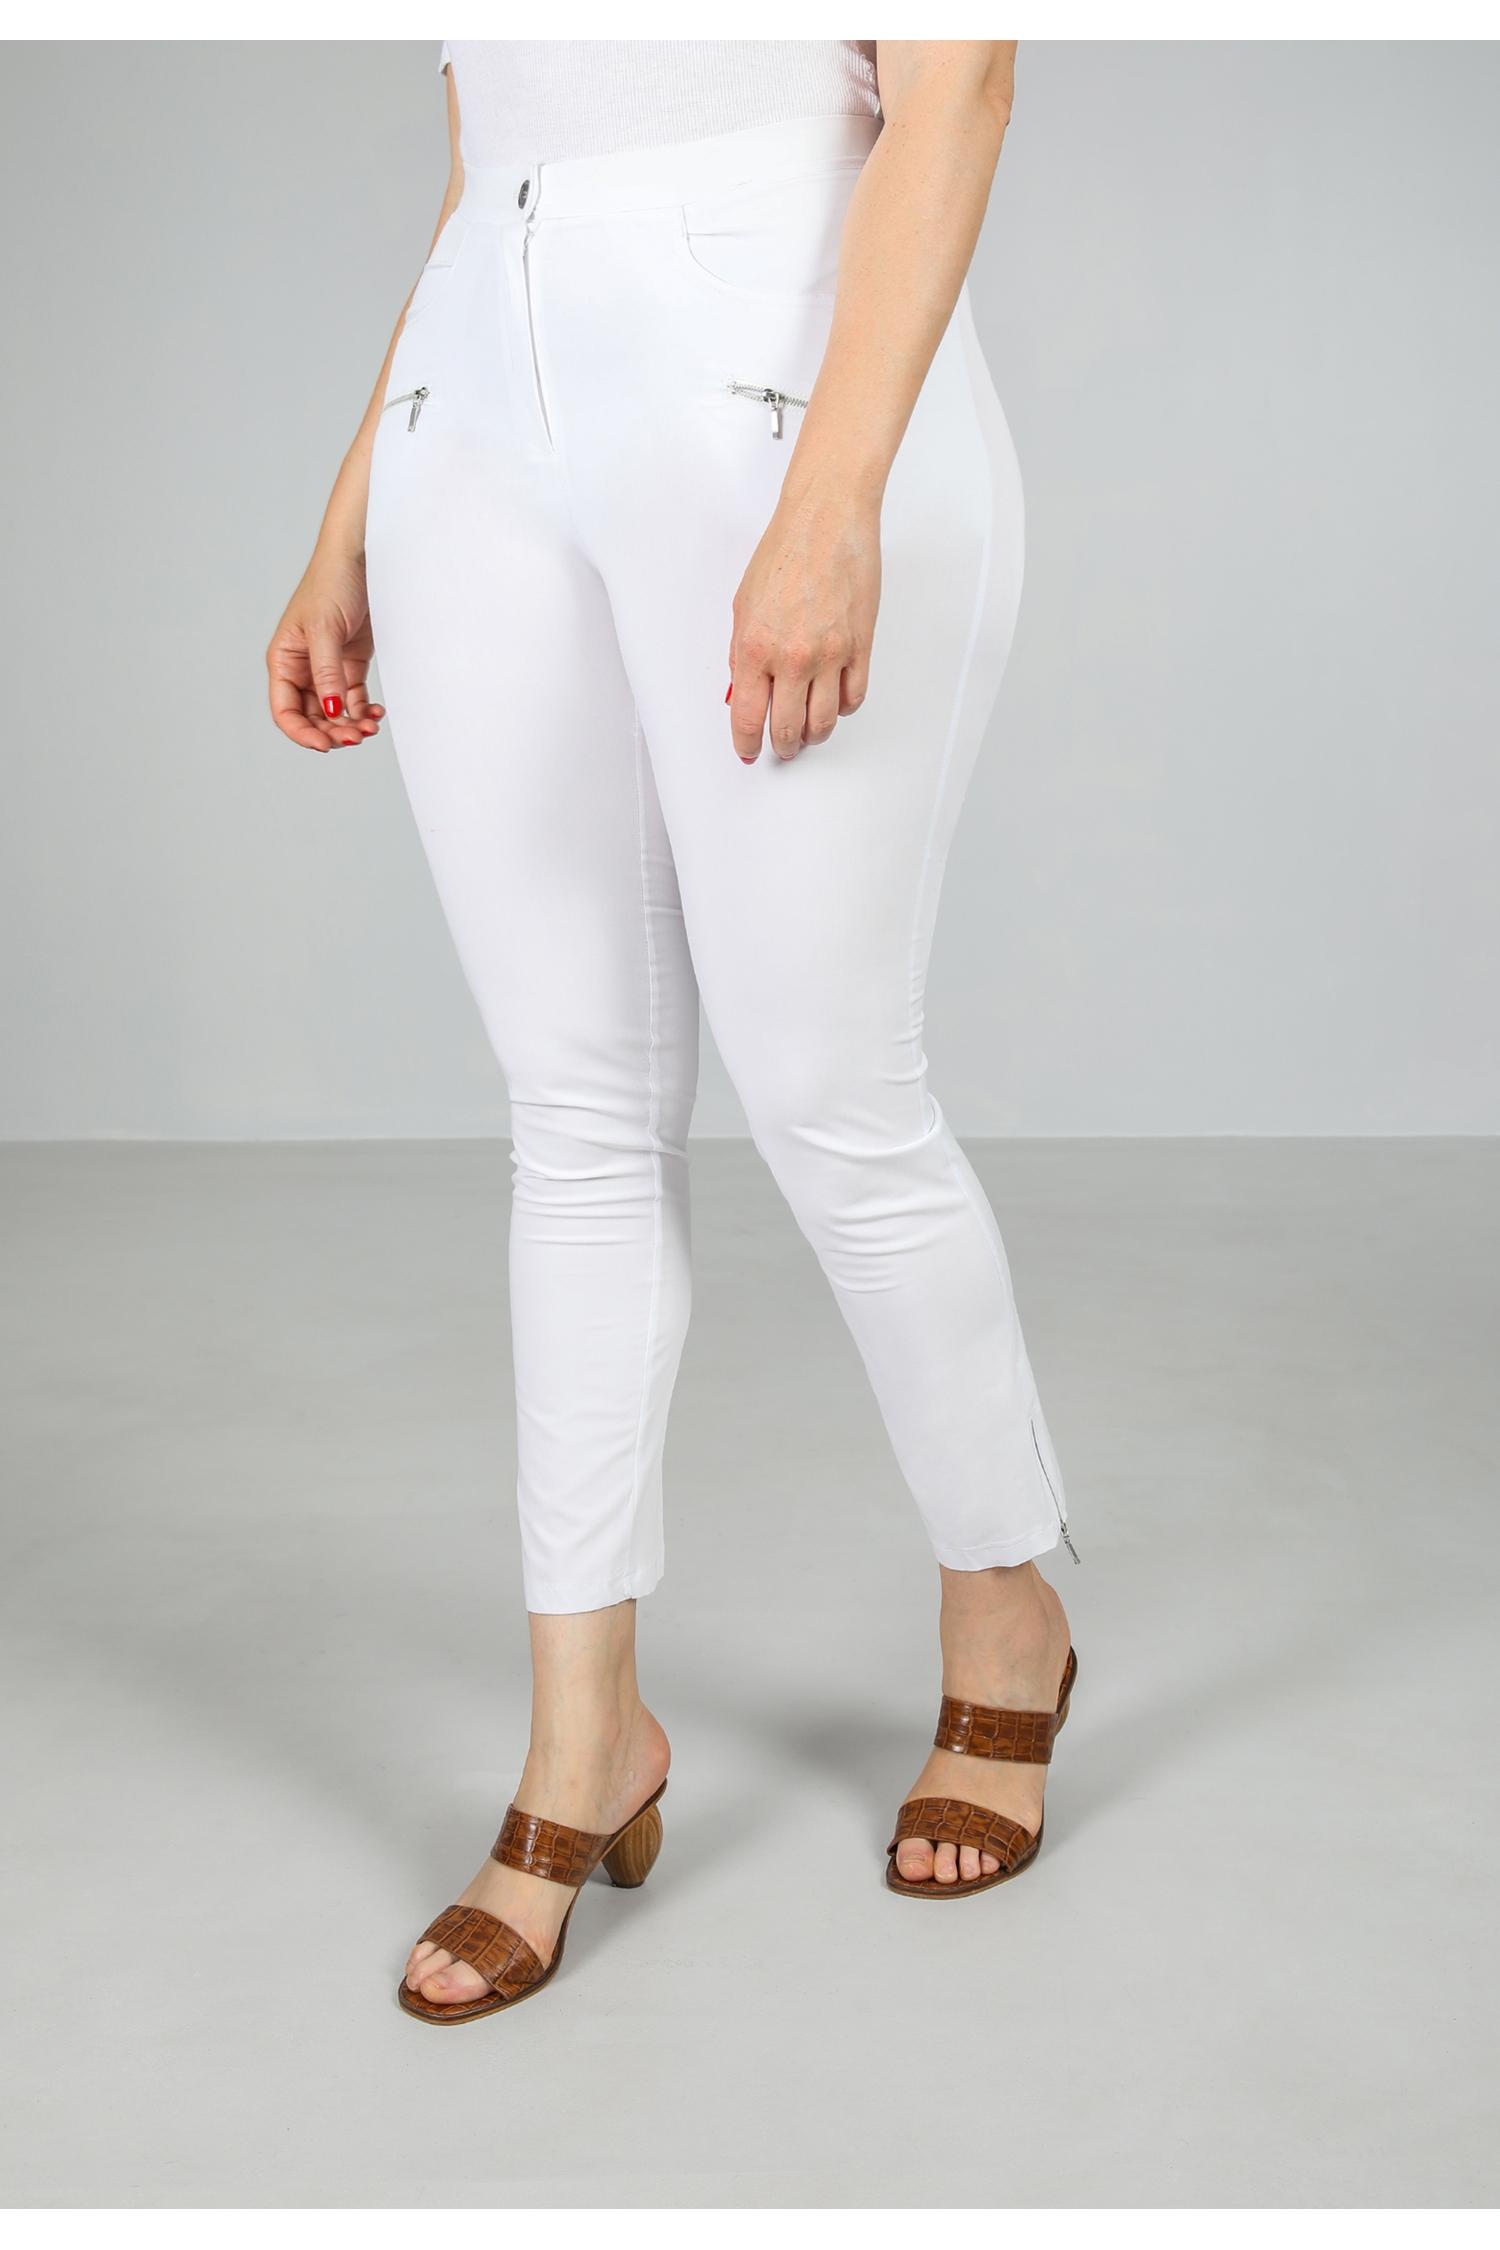 Flowing pants detail zipped